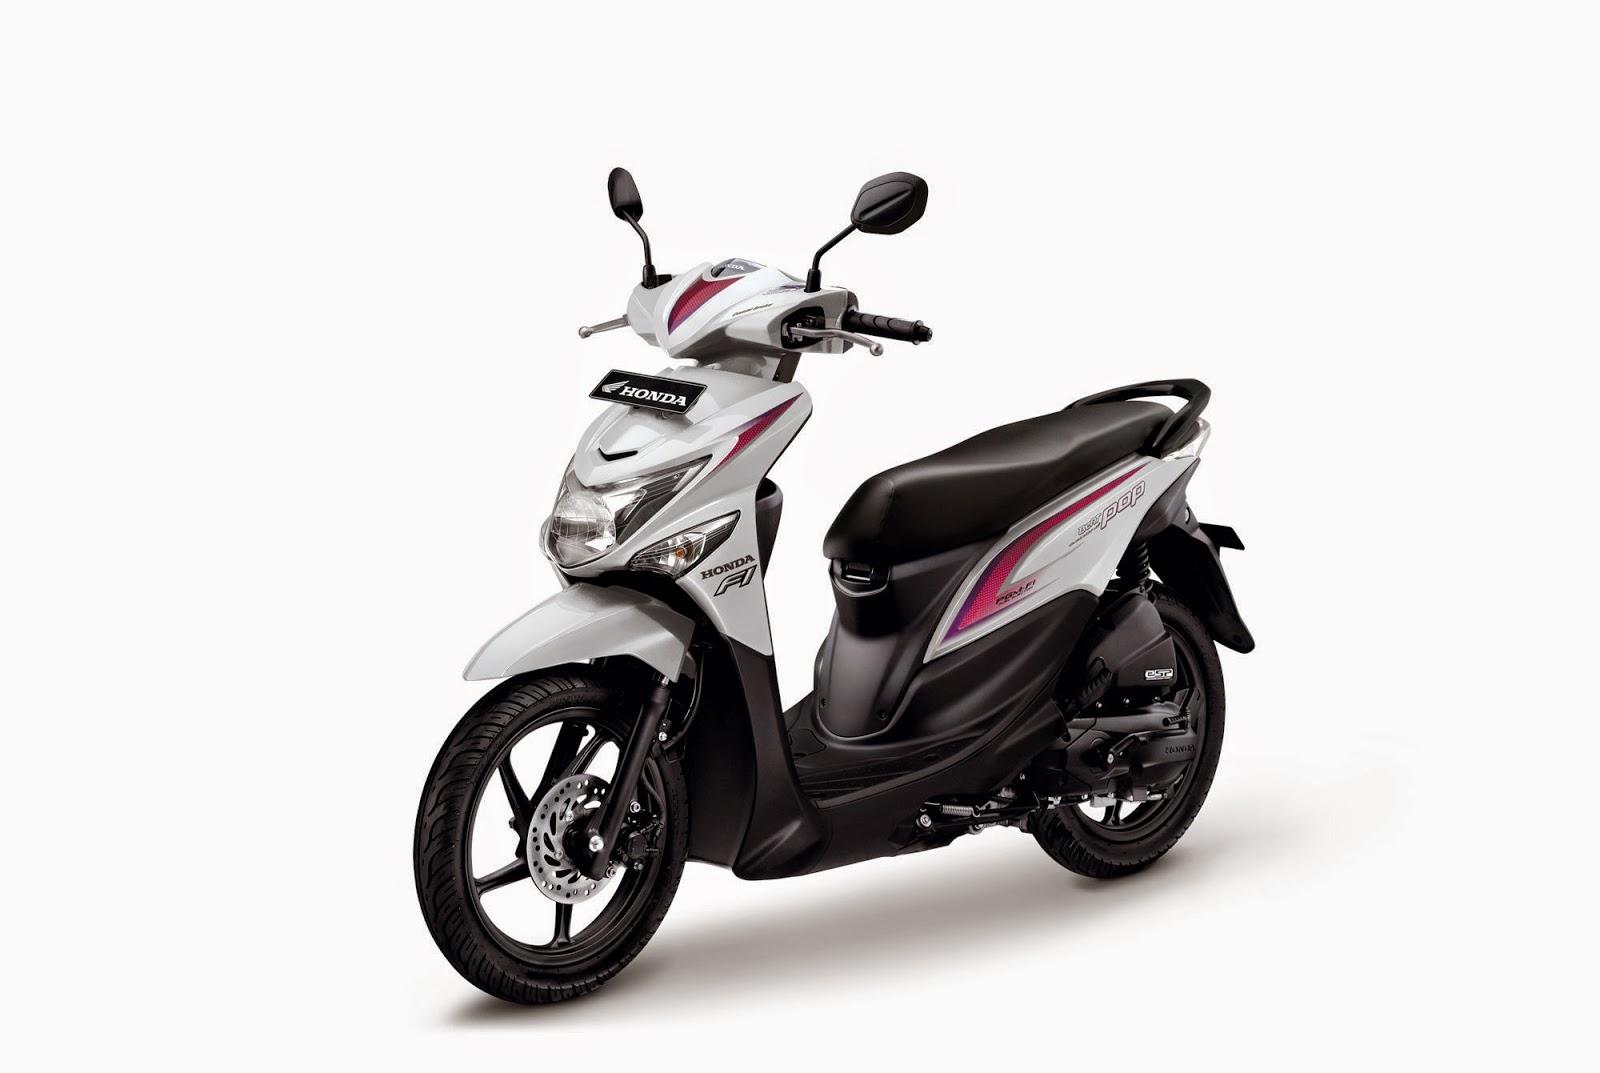 Kumpulan Gambar Motor Beat Terlengkap Oneng Motomania All New Sporty Esp Cbs Garage Black Salatiga Prawidyati Ratnasari Google